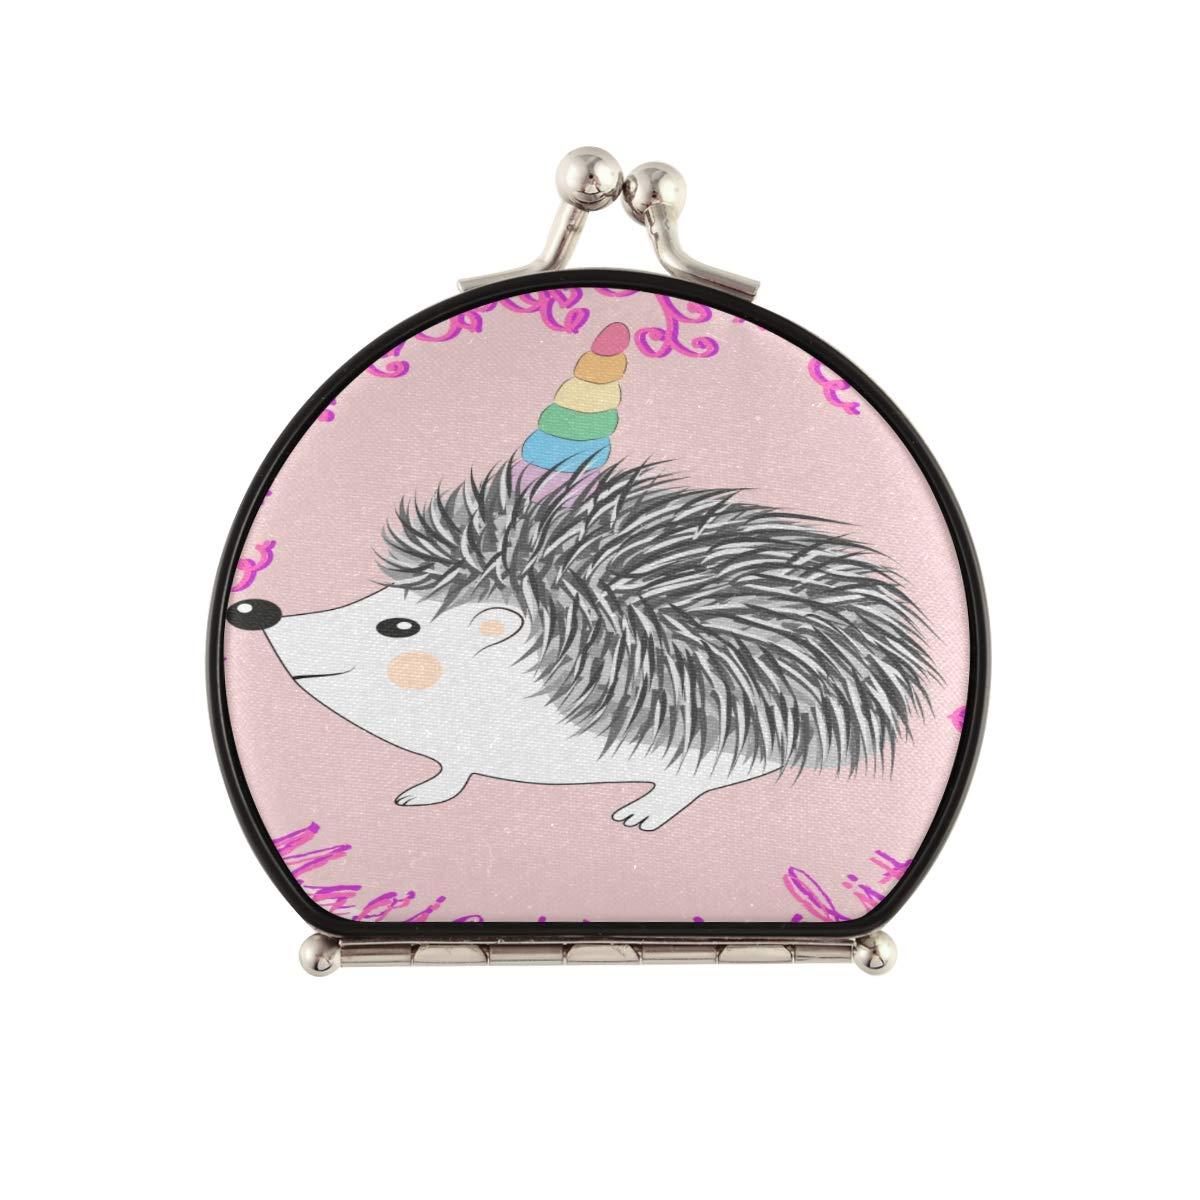 Magnifying Compact Cosmetic Mirror Hedgehog Cute Unicorn Max 47% OFF Ranking TOP7 Cartoon